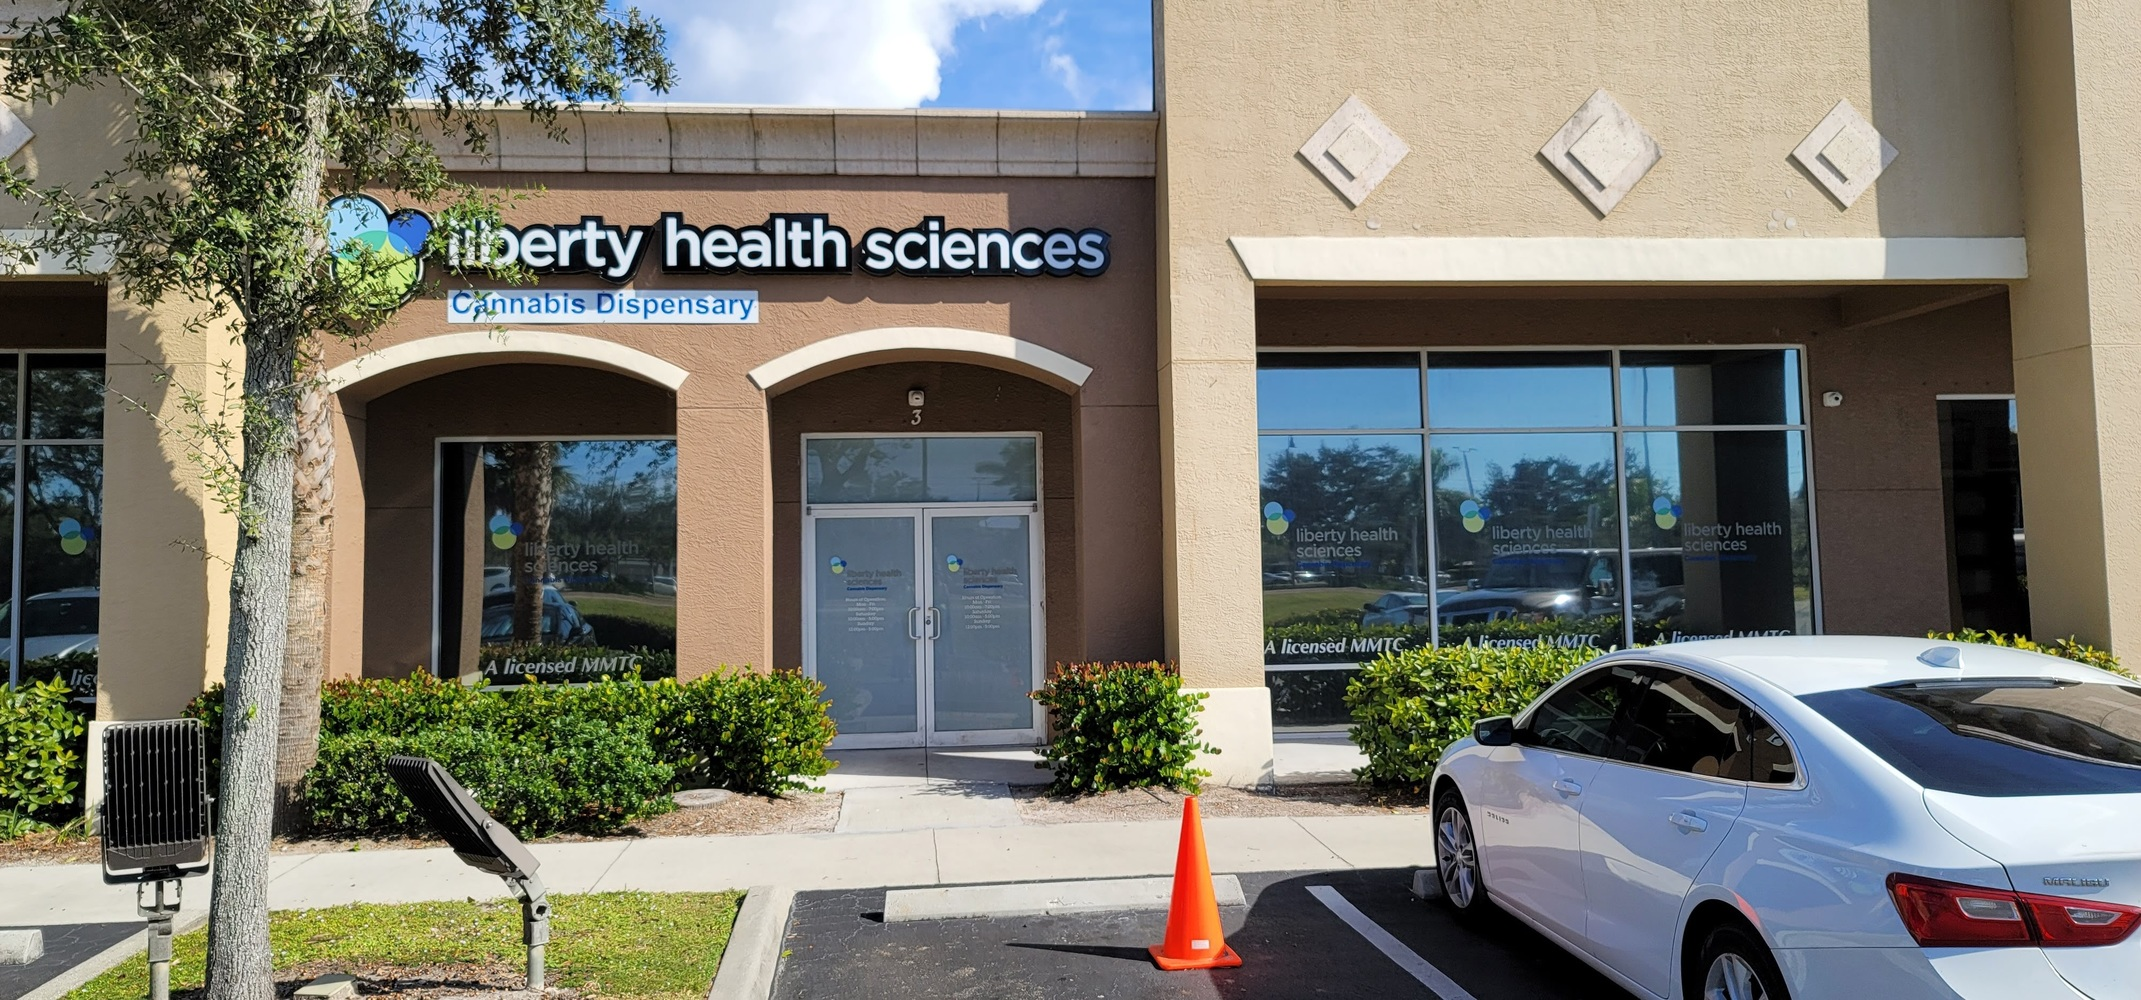 Liberty Health Sciences Medical Marijuana Dispensary Bonita Springs